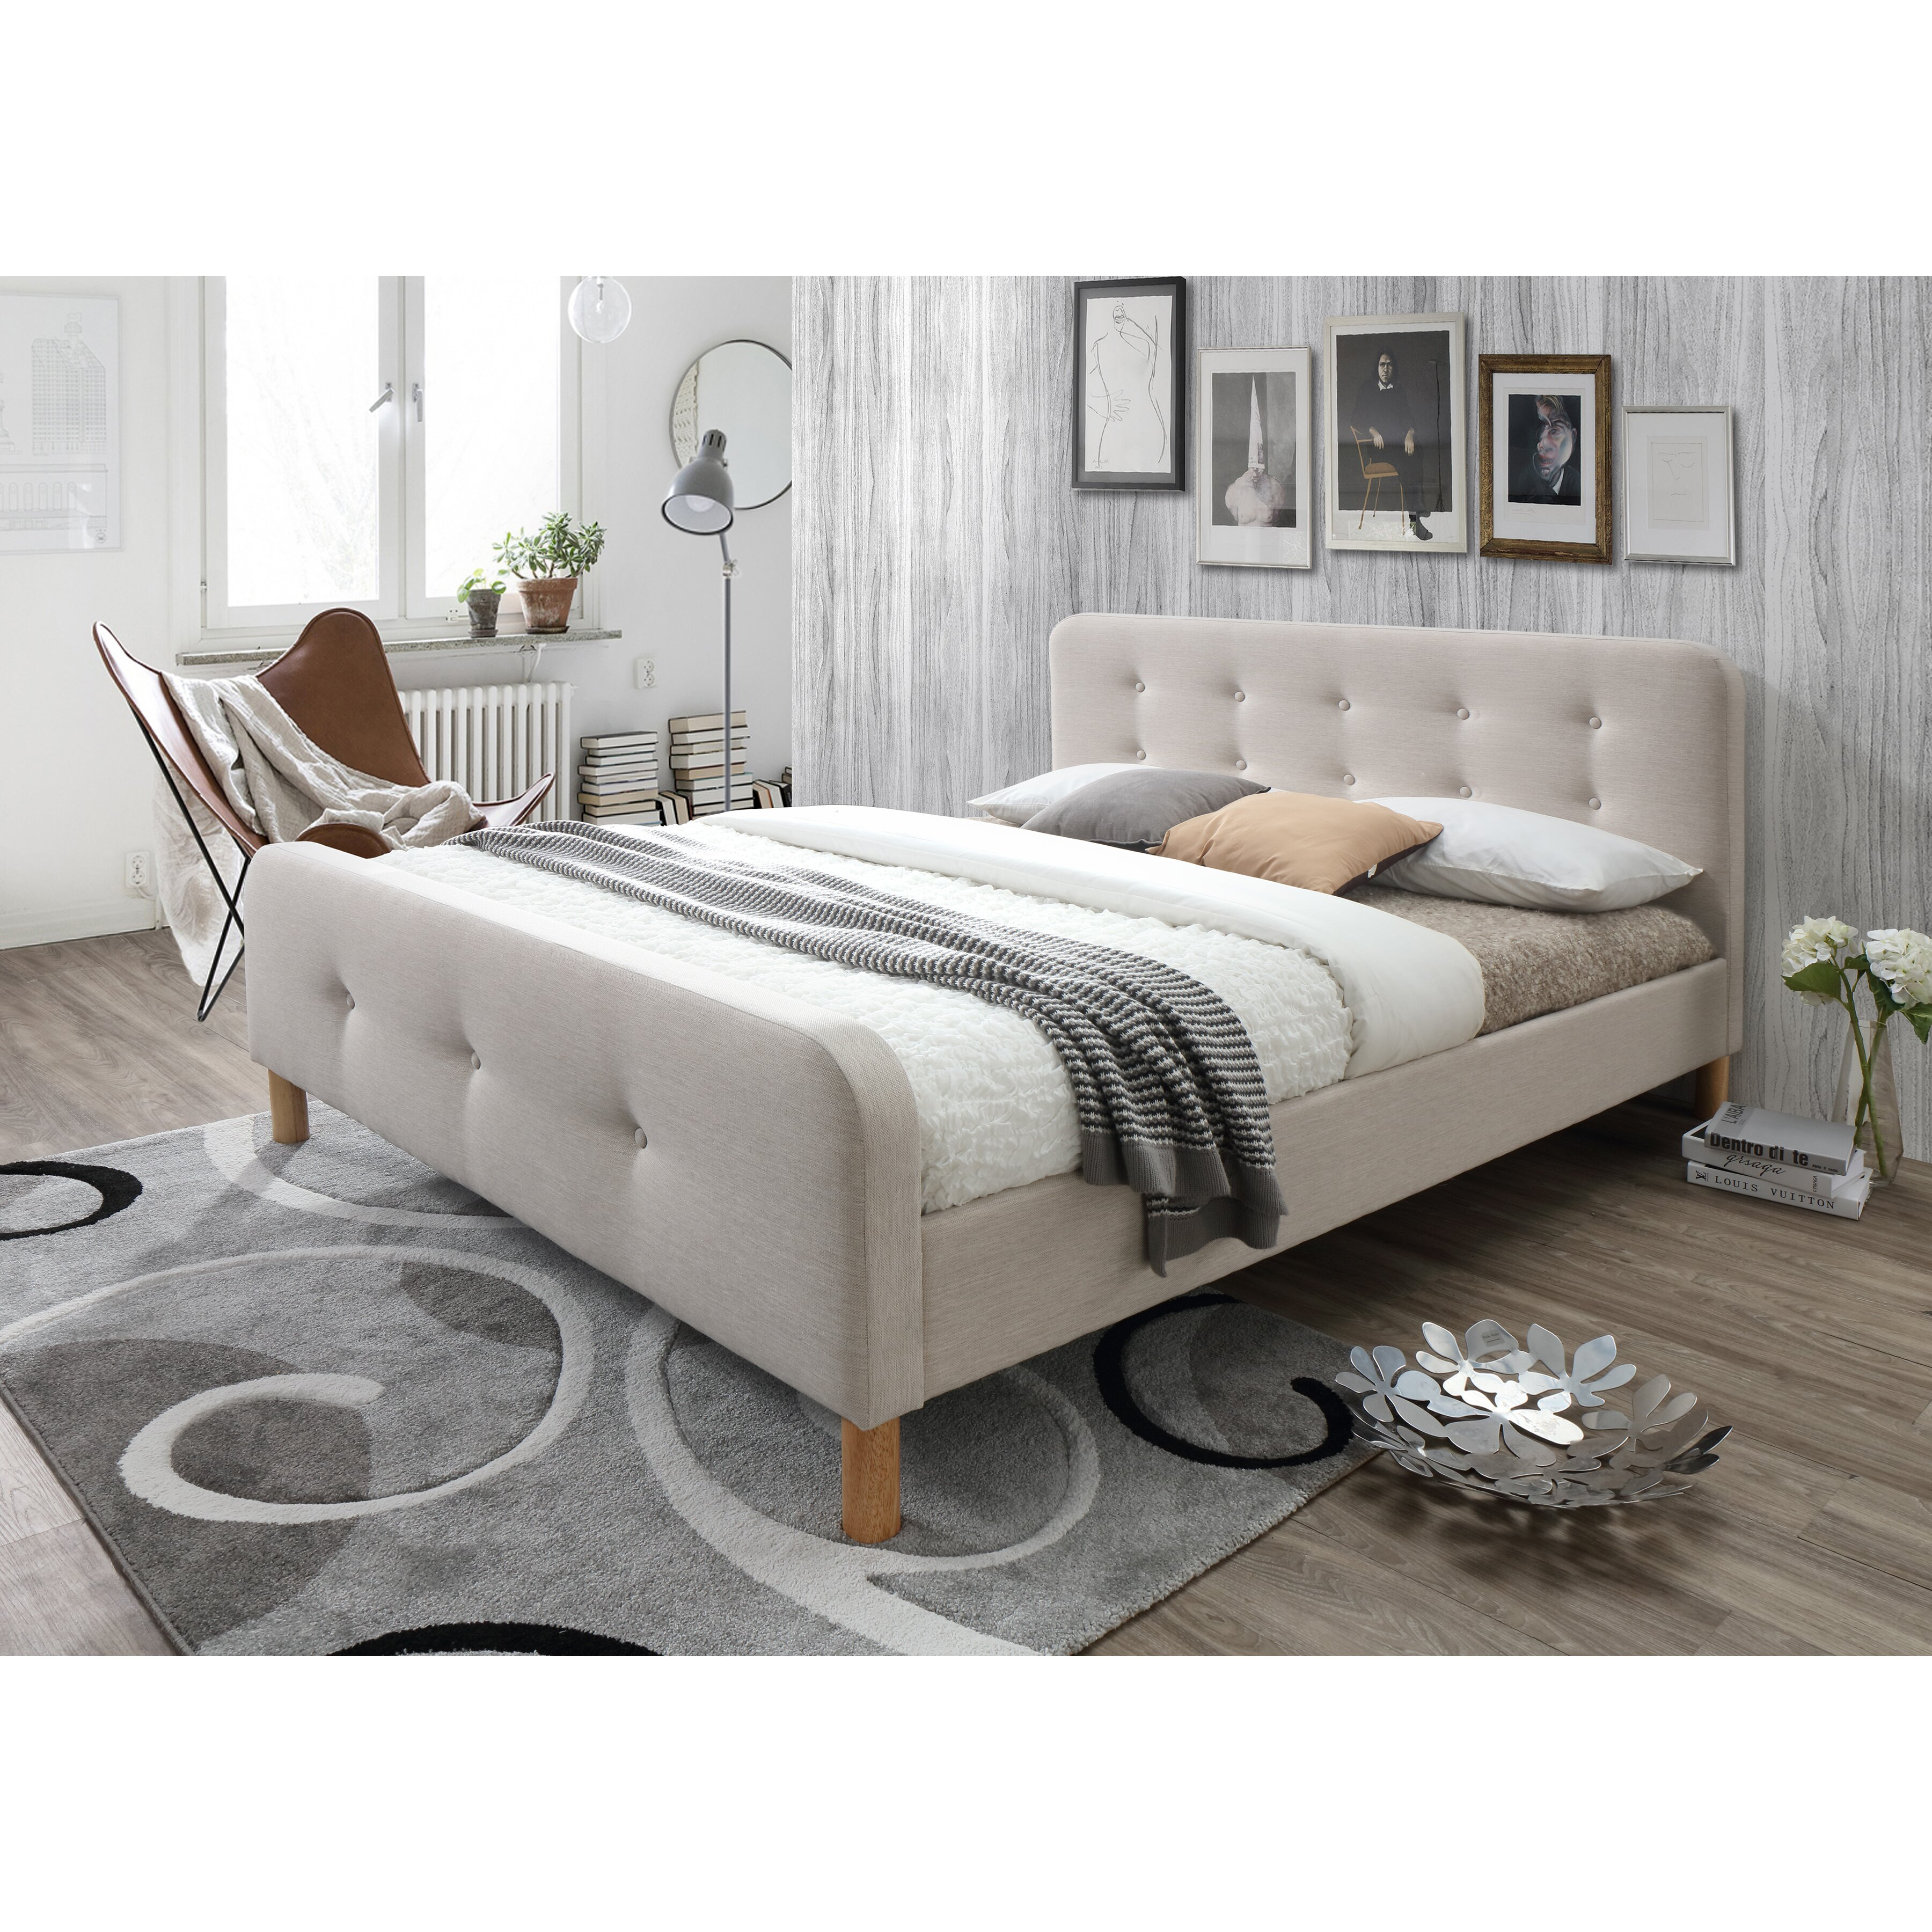 Wholesale Interiors Baxton Studio Riccardo Mid Century Fabric Upholstered Platform Bed Reviews